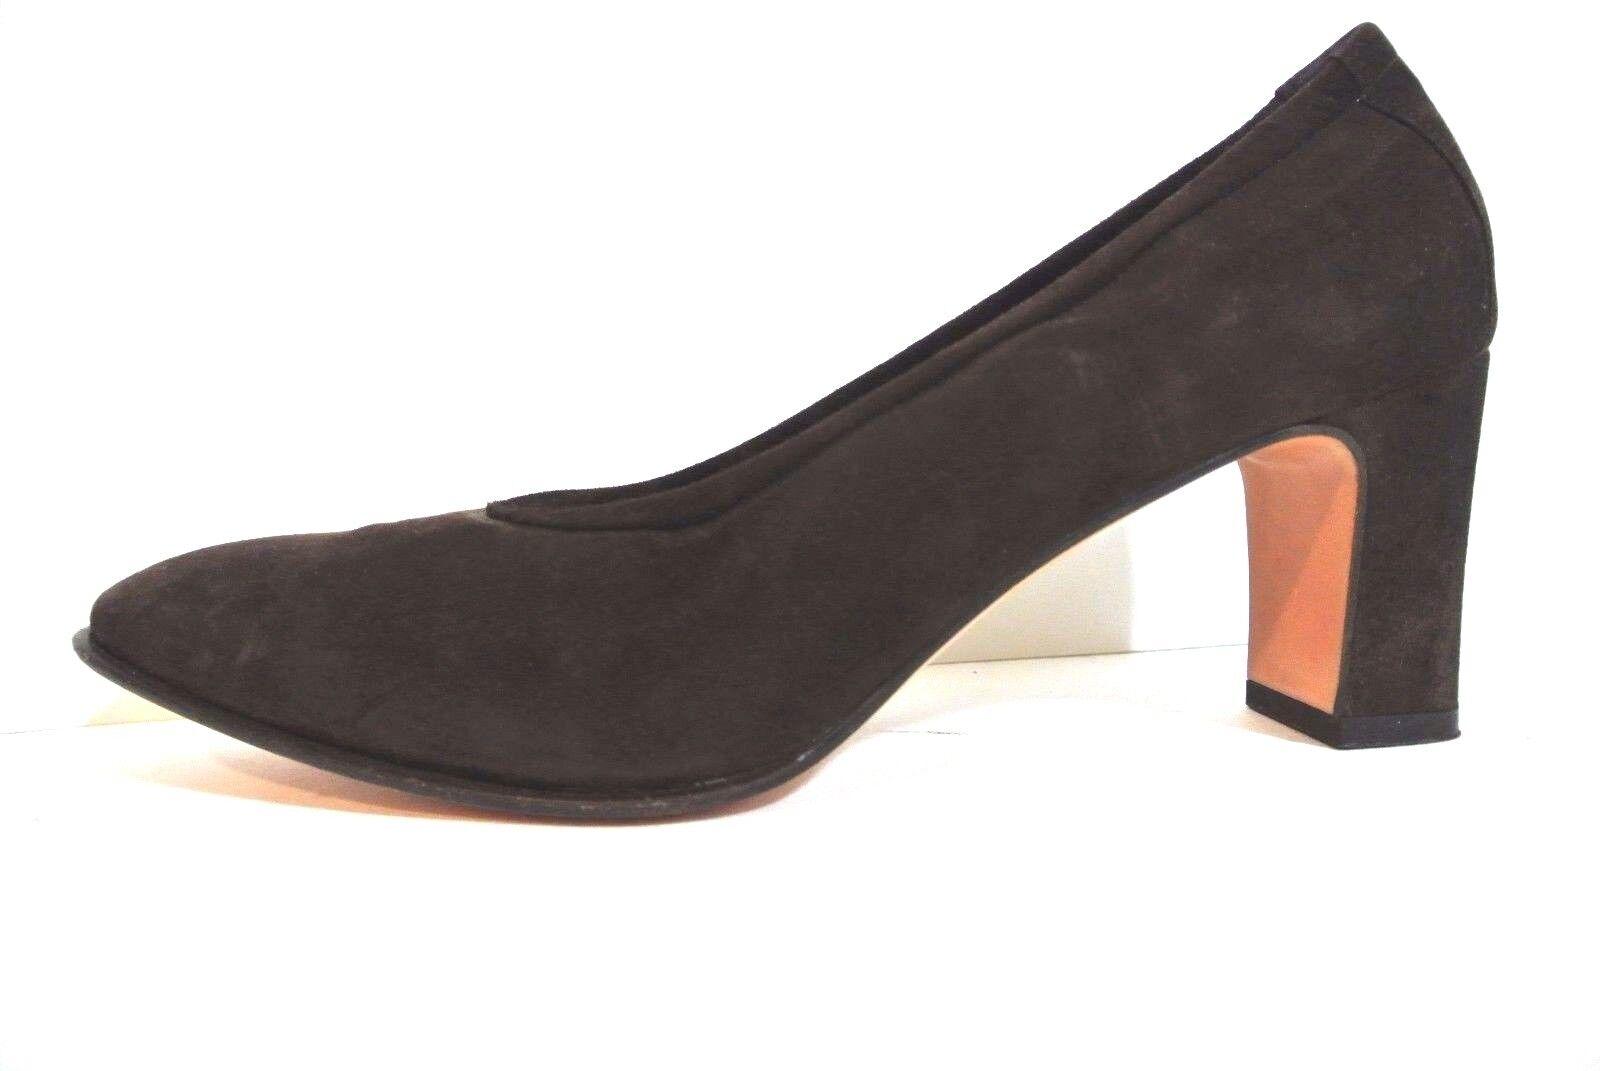 SALVATORE FERRAGAMO shoes Brown suede womens high heel classic pumps 8.5M